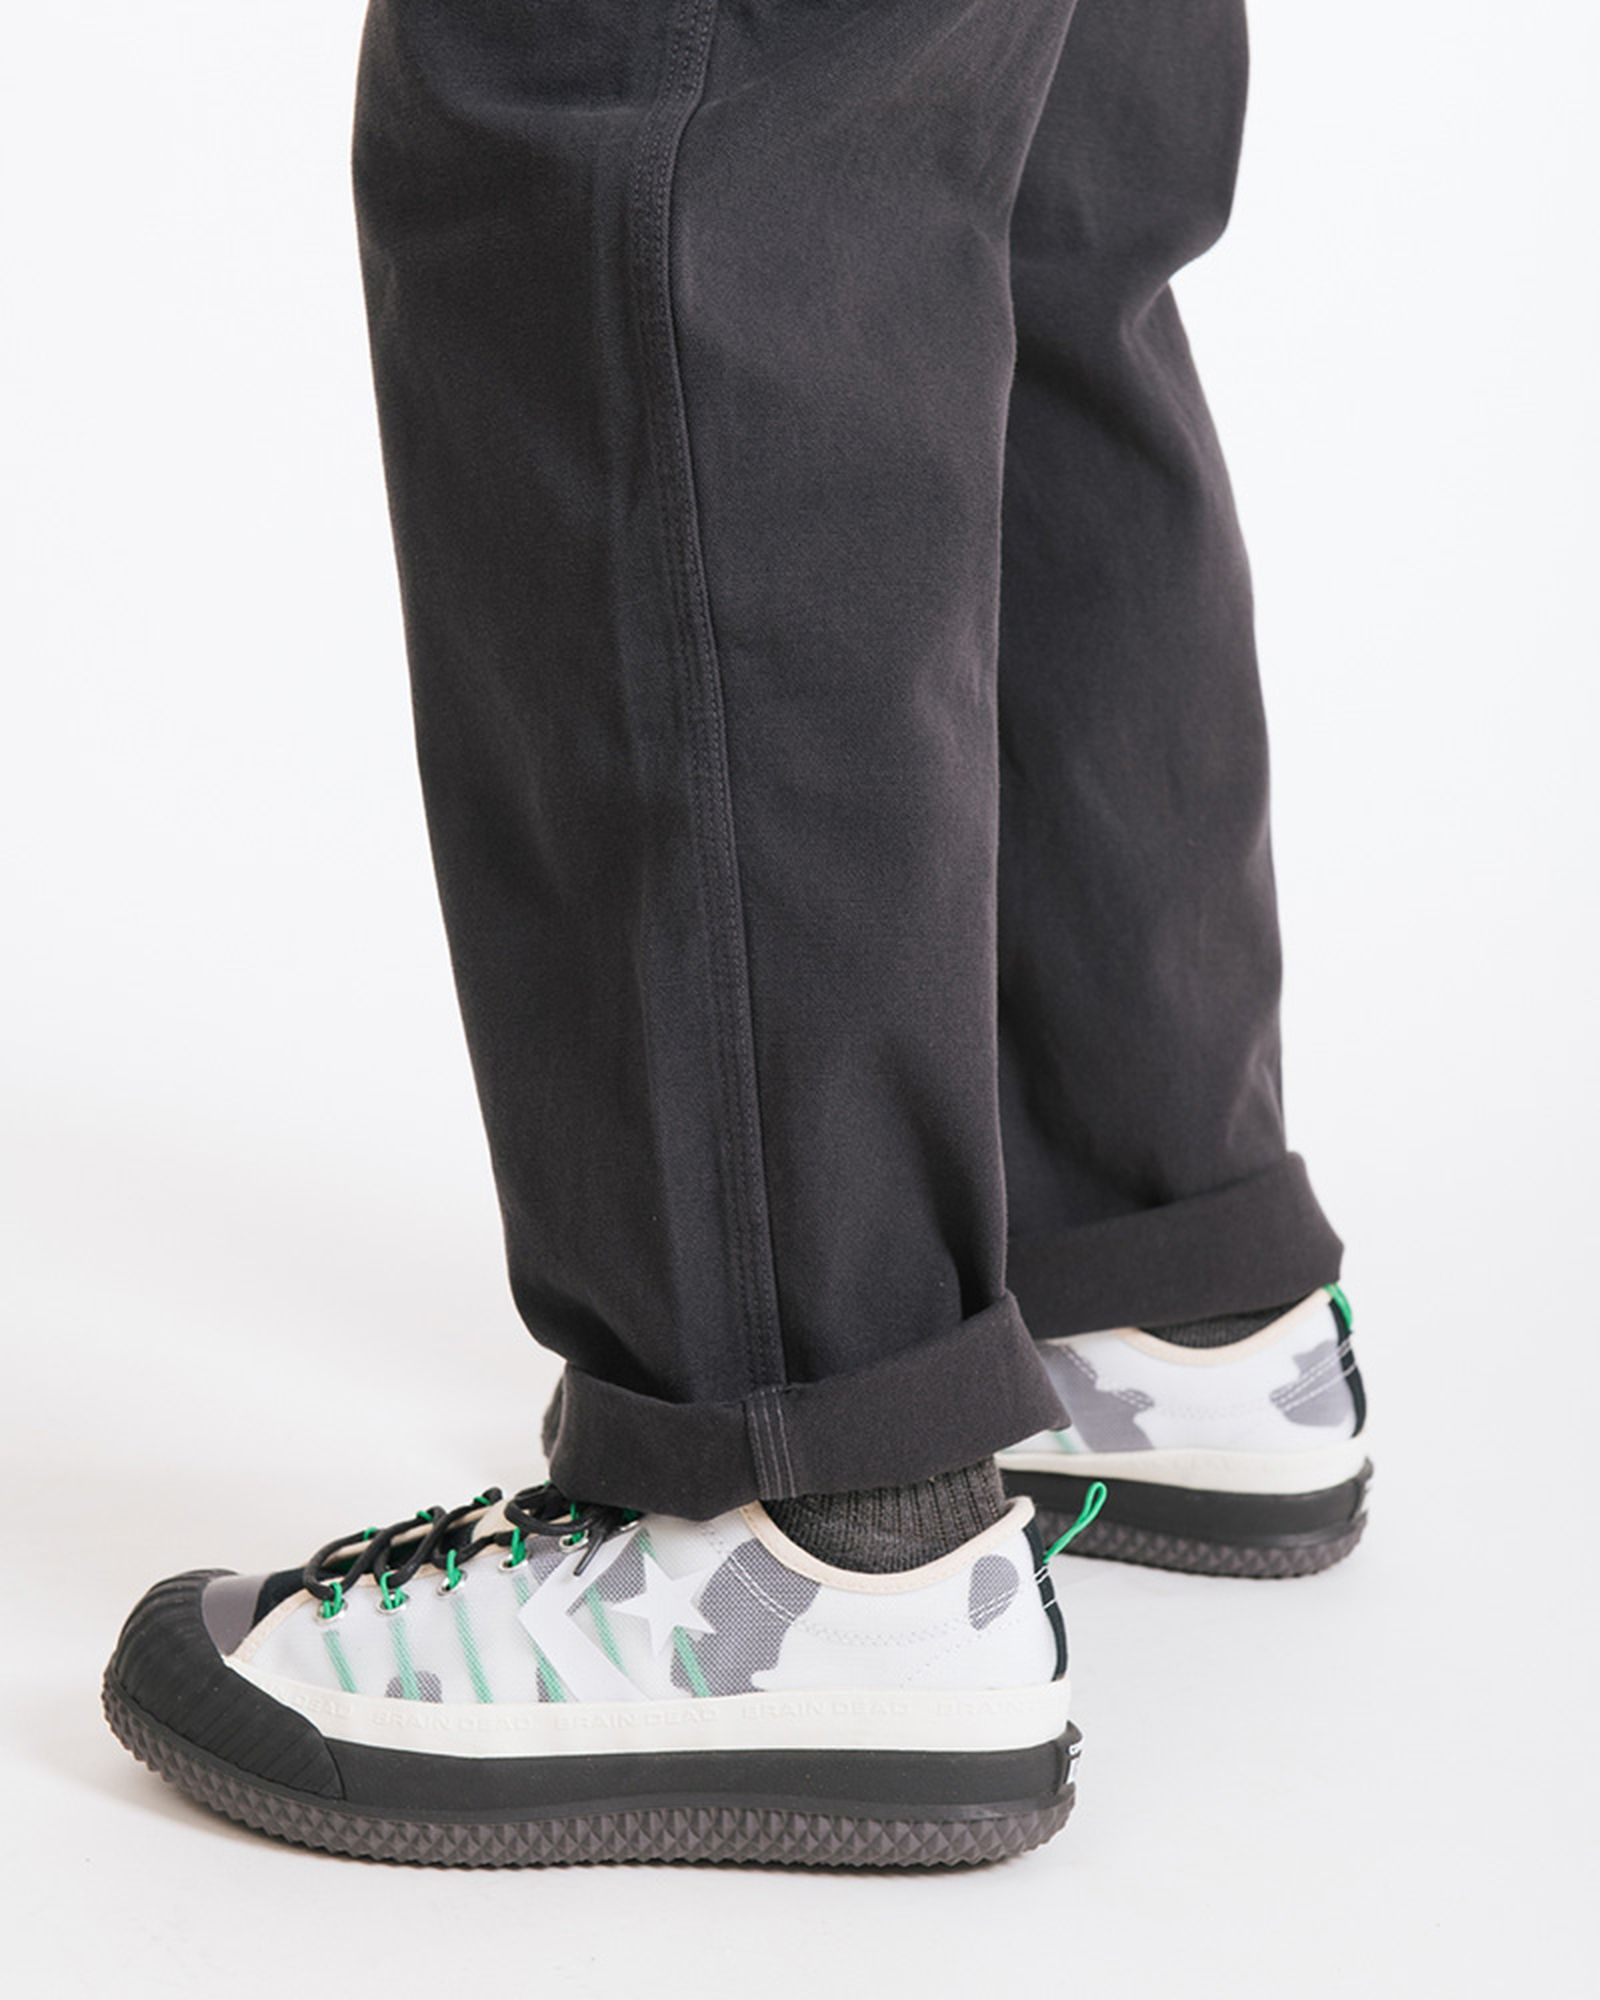 braindead-converse-chuck-taylor-fw20-release-date-price-01